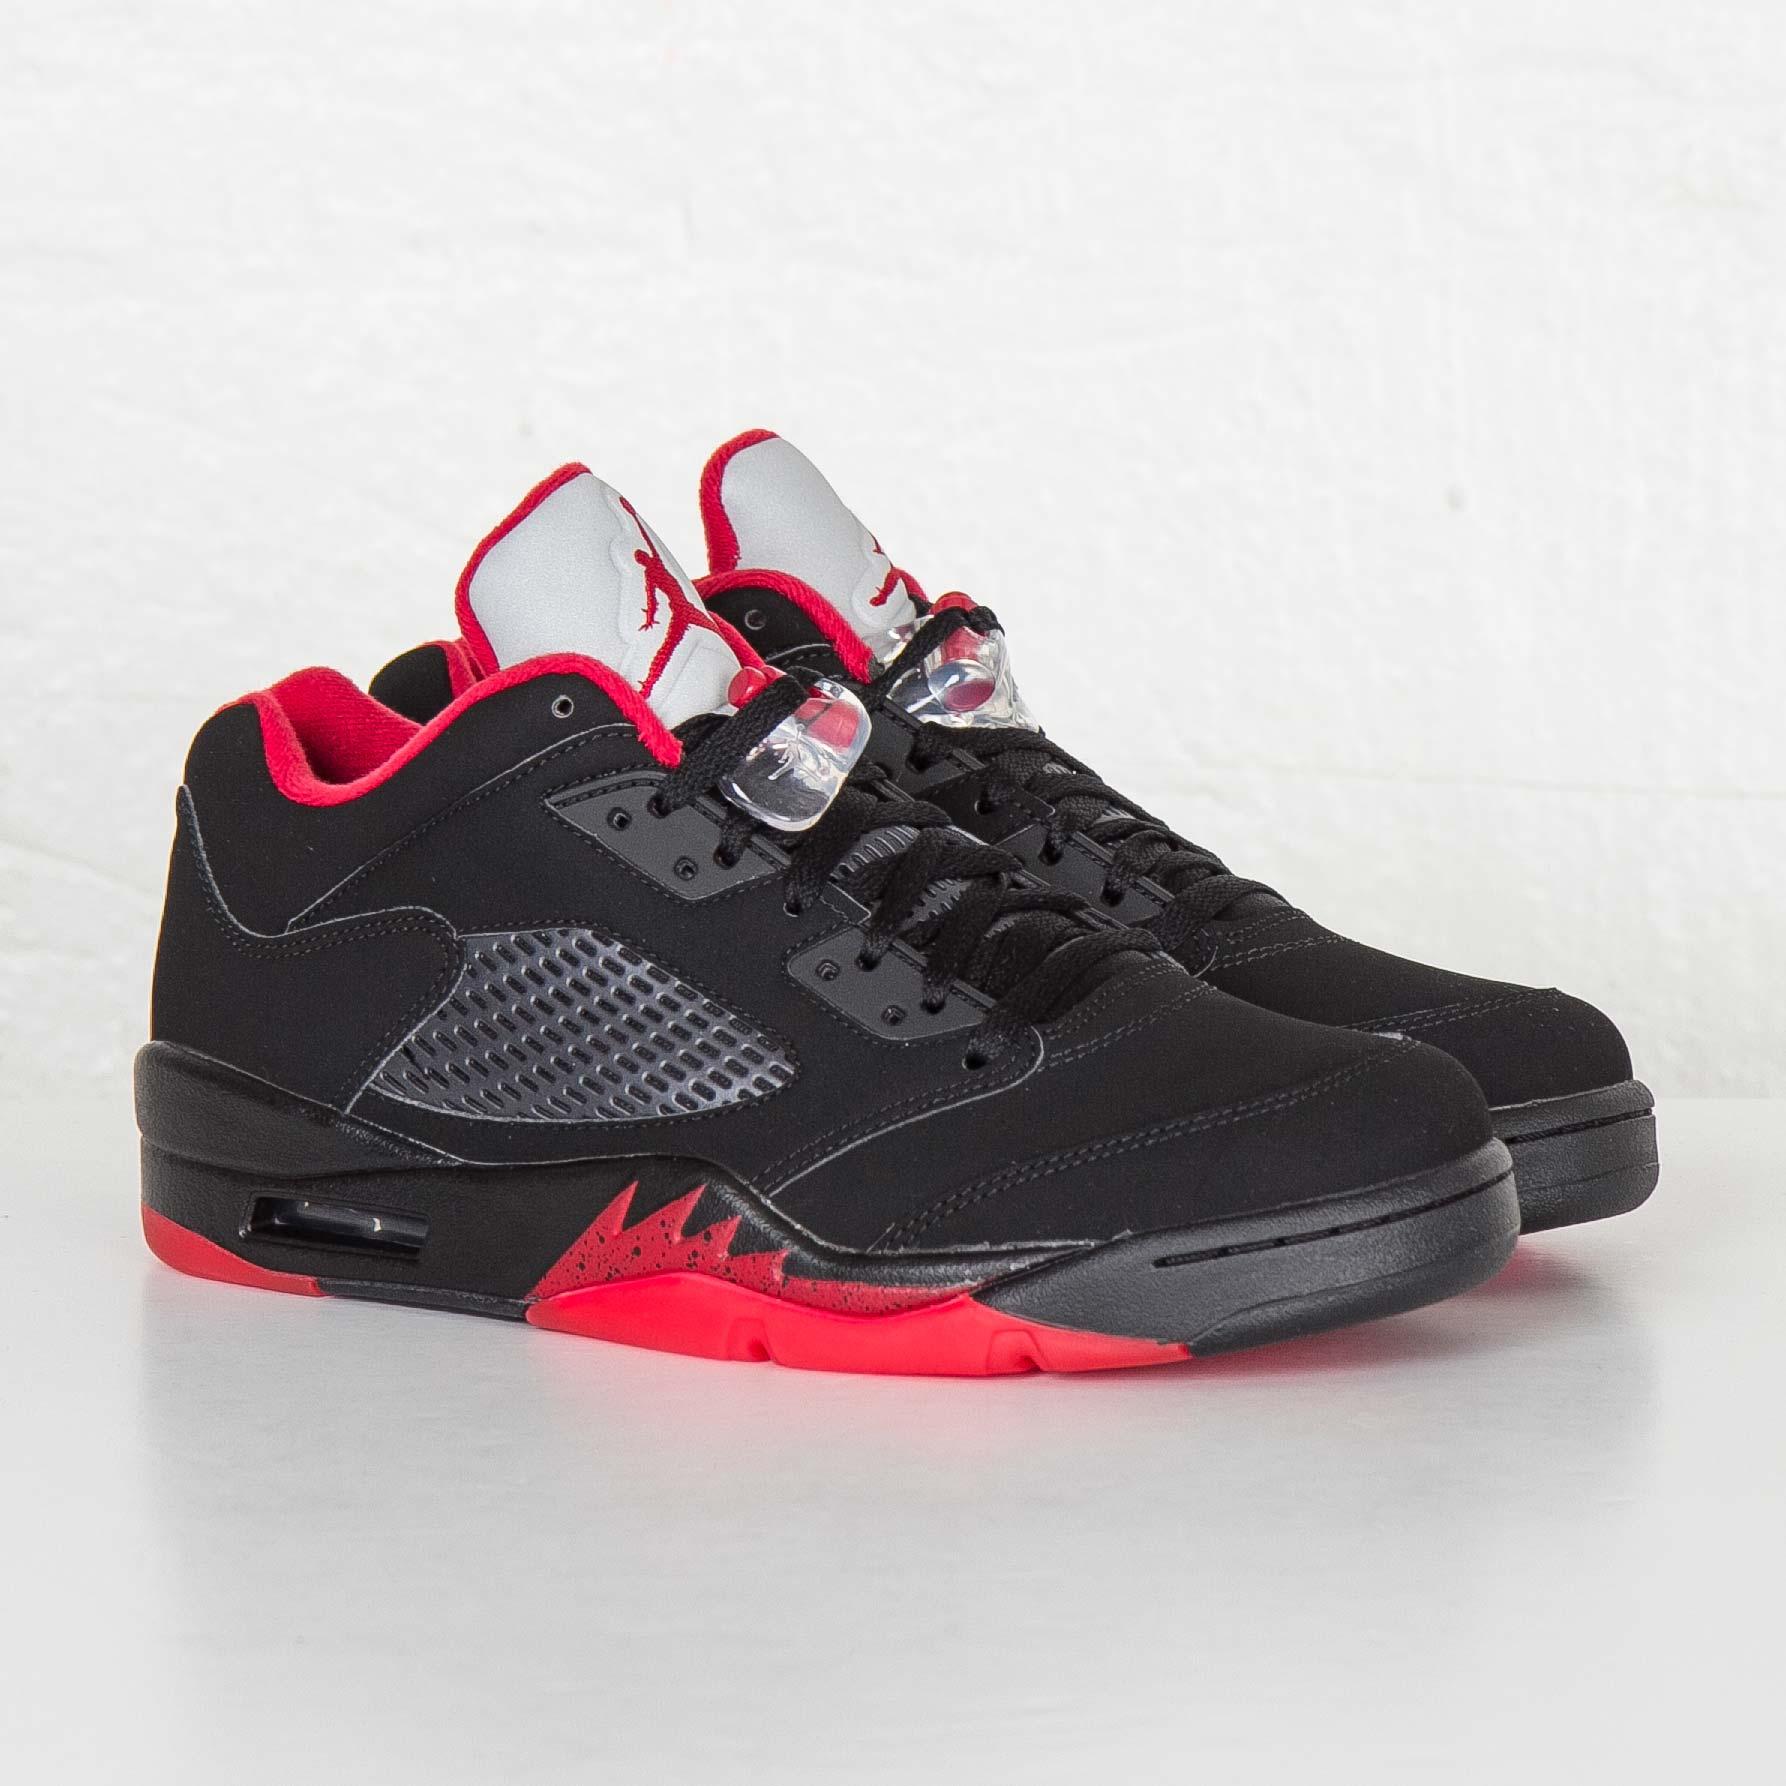 new style b88f8 17d89 Jordan Brand Air Jordan 5 Retro Low